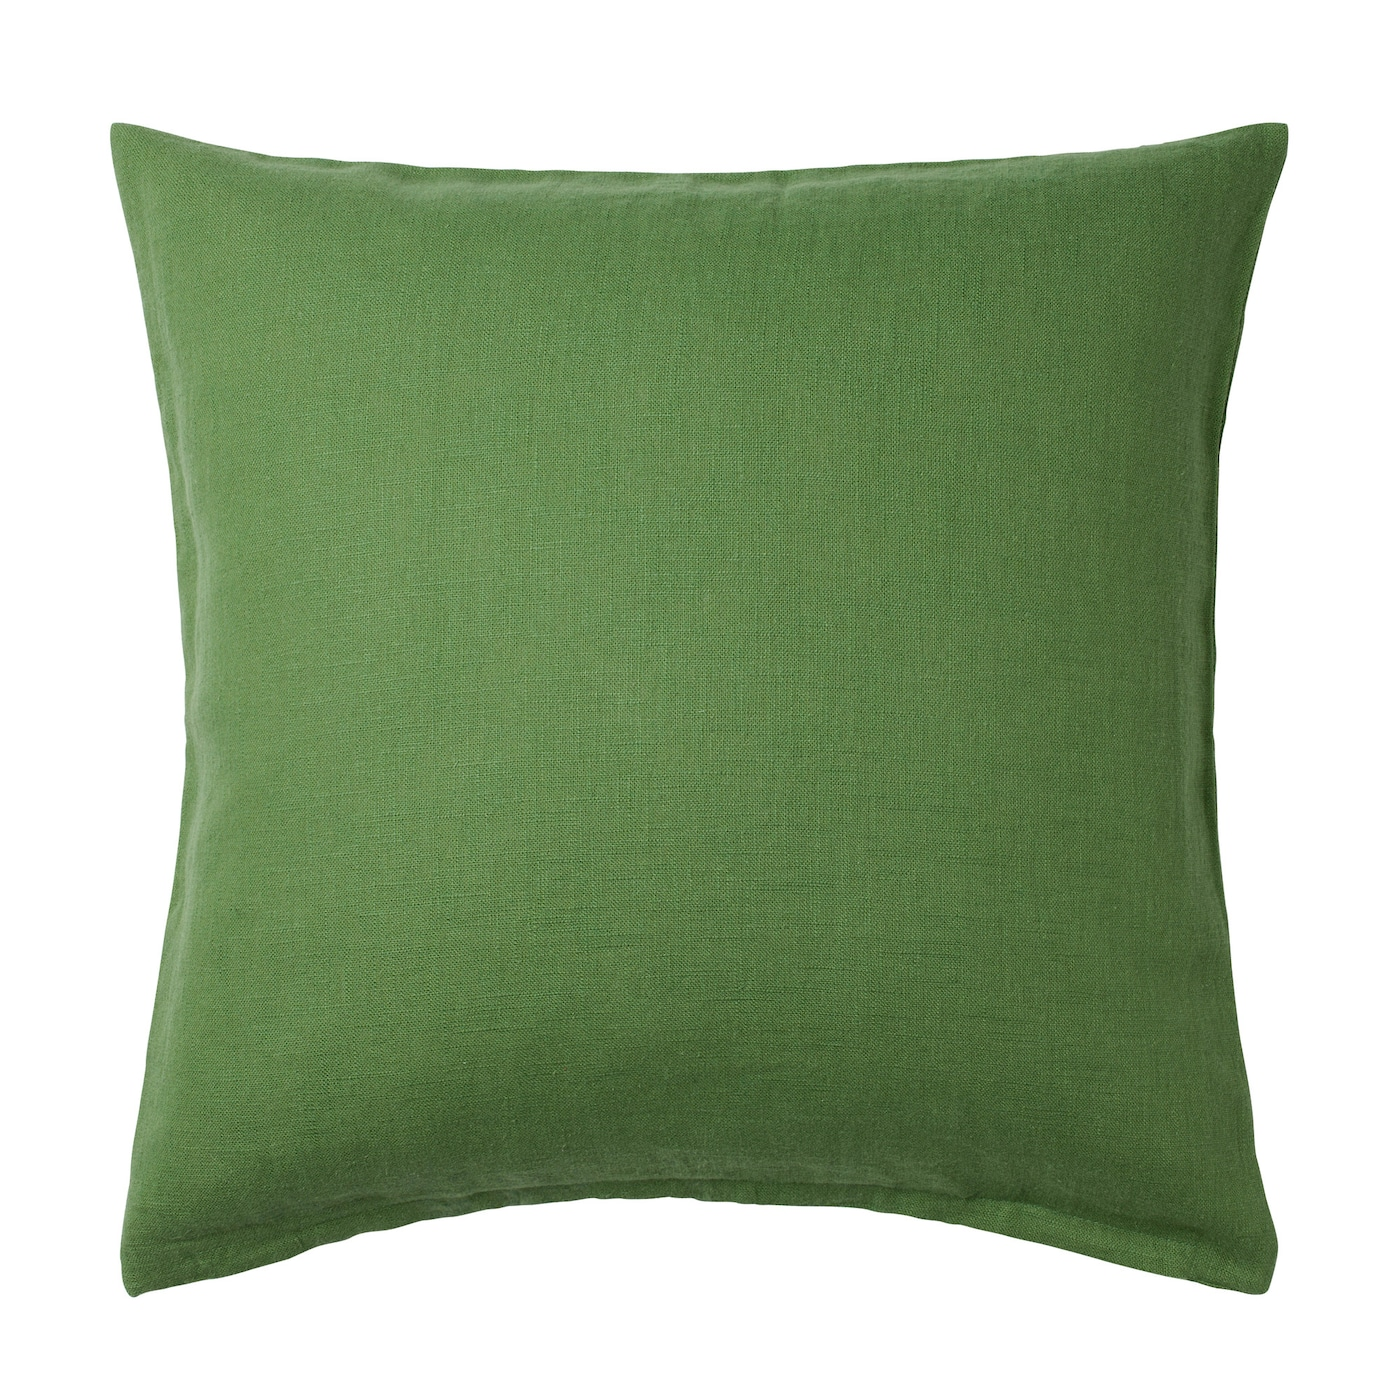 VIGDIS Cushion cover Green 50x50 cm IKEA